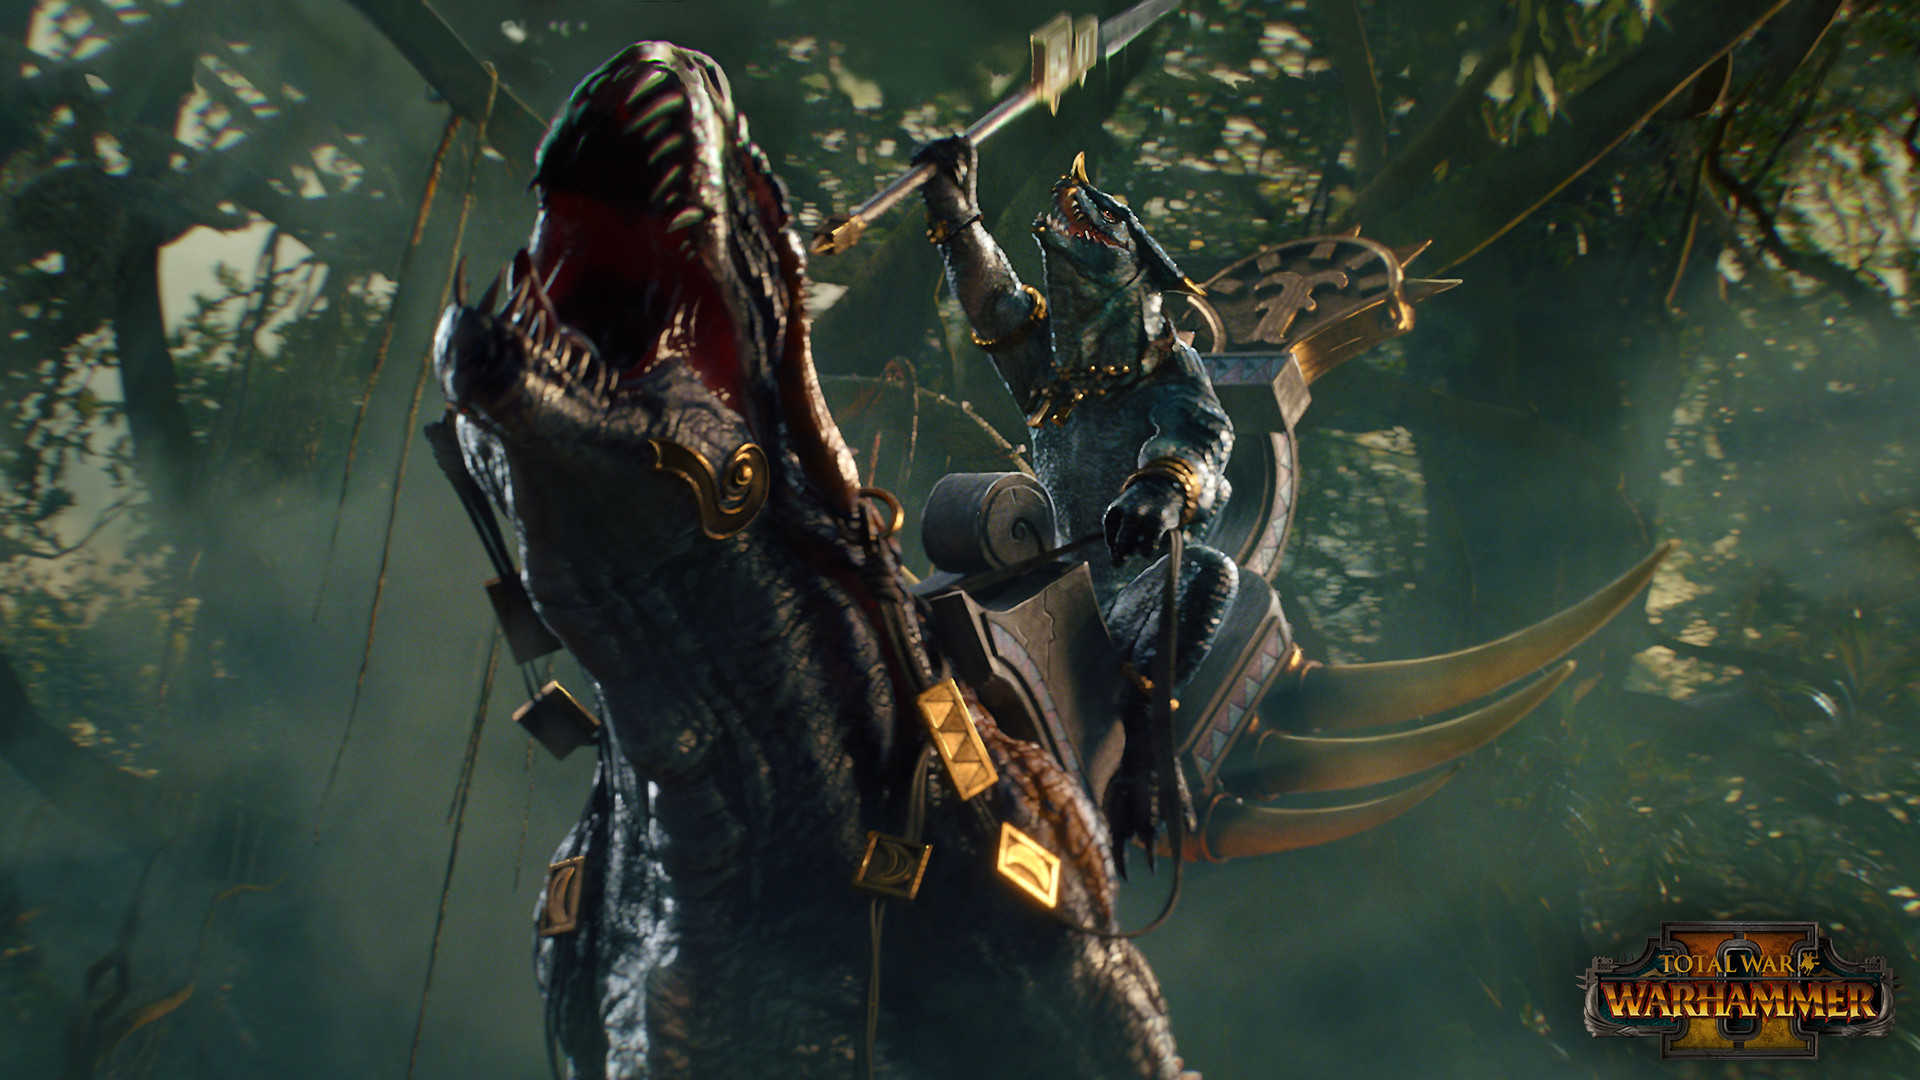 Video Game – Total War: Warhammer II Wallpaper